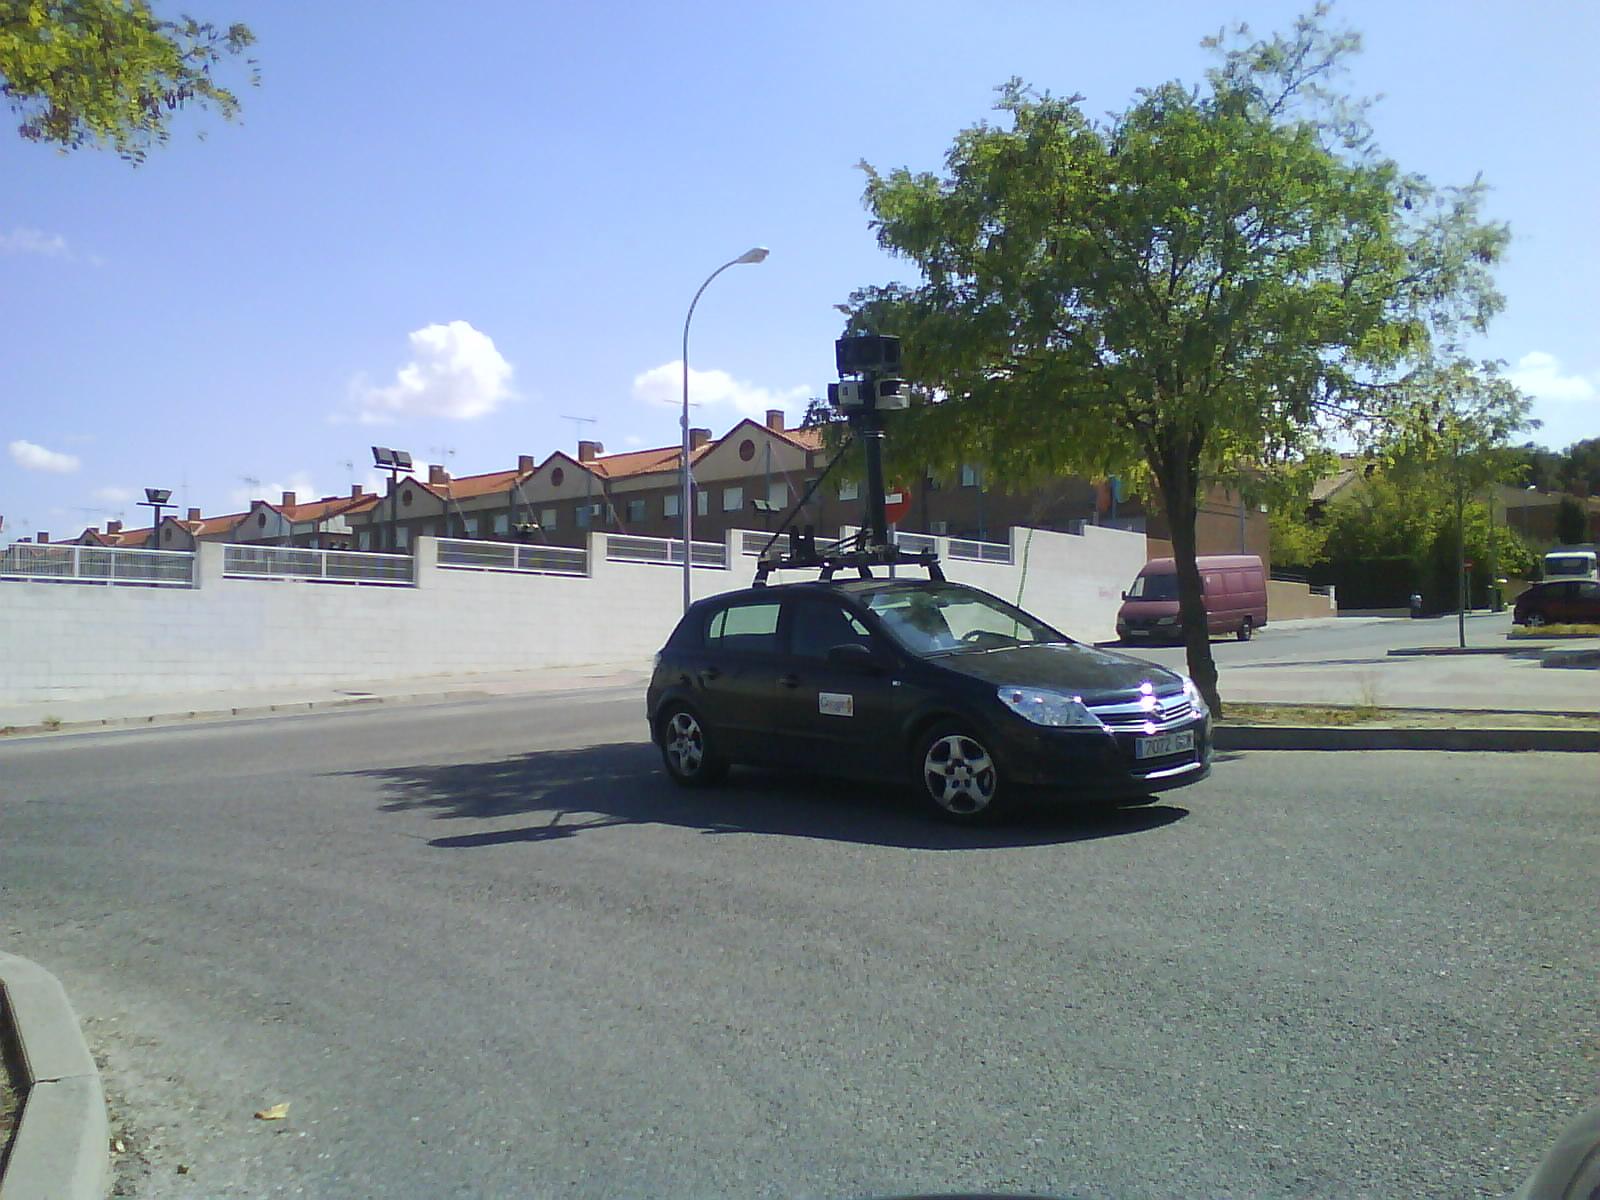 File:Google Street View Car in Aranjuez.jpg - Wikimedia Commons